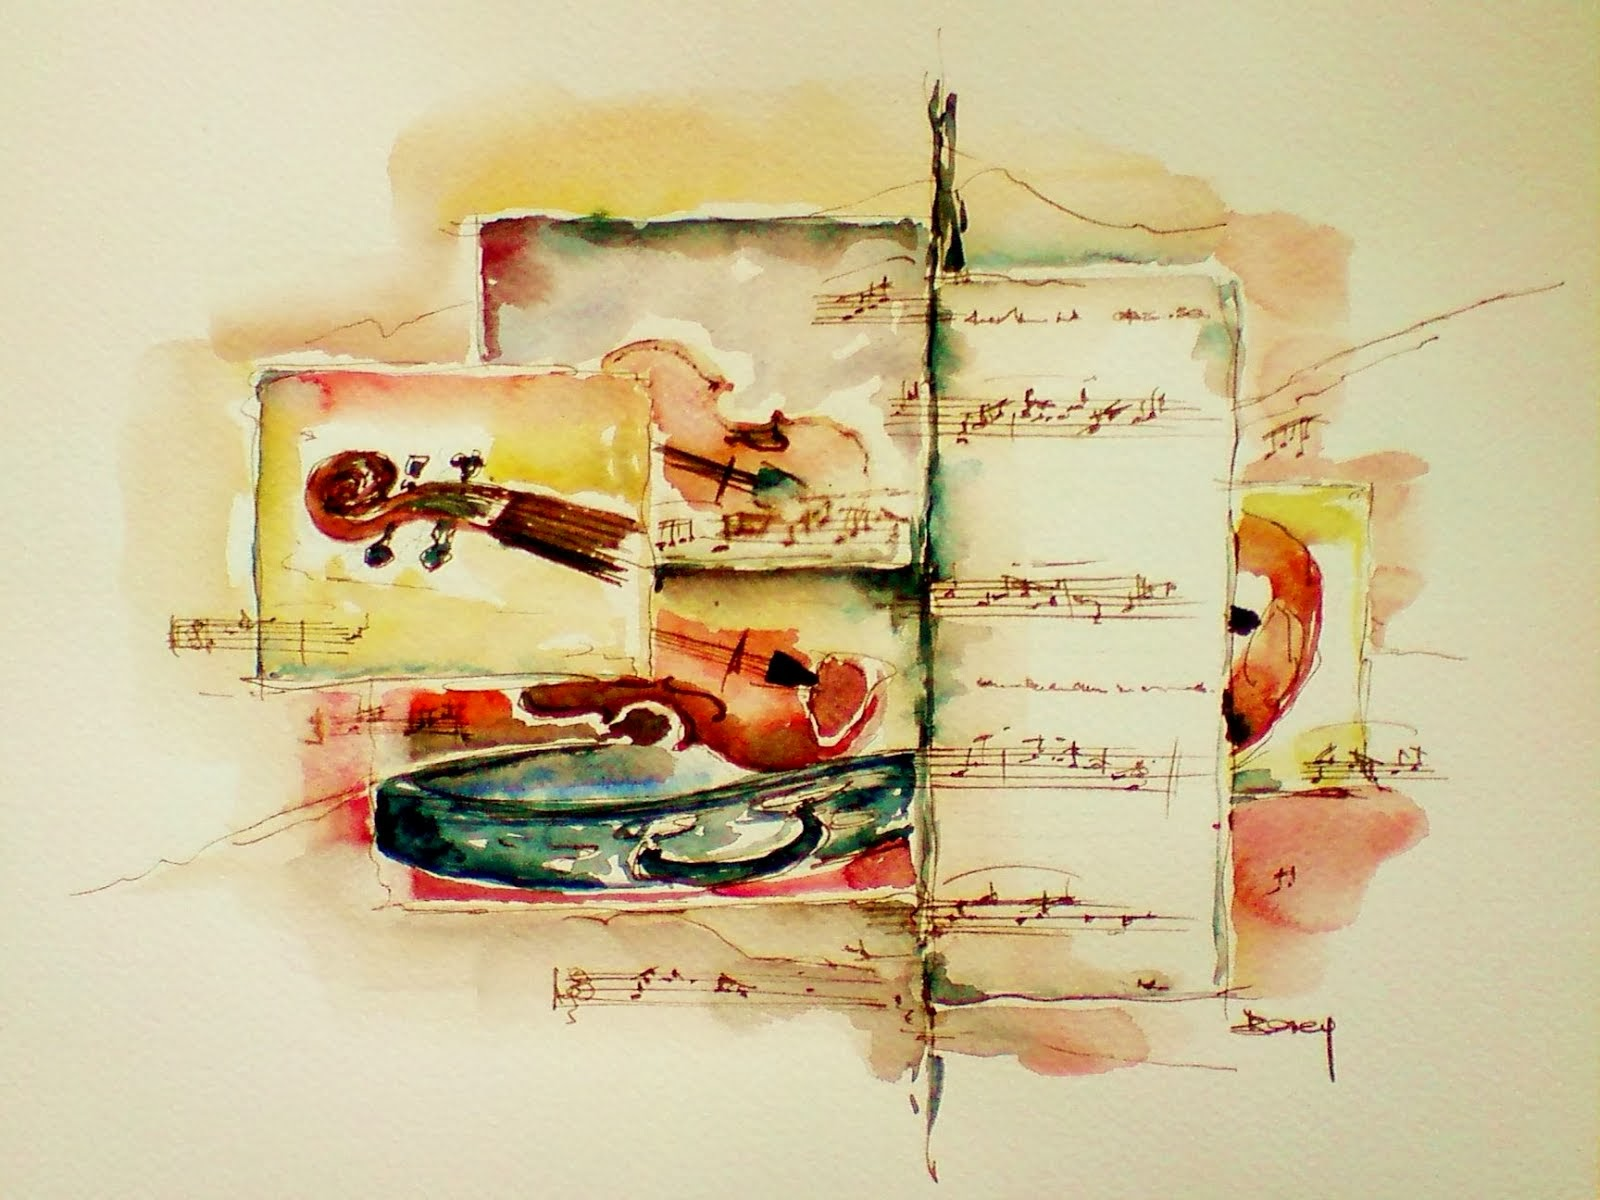 En musique!